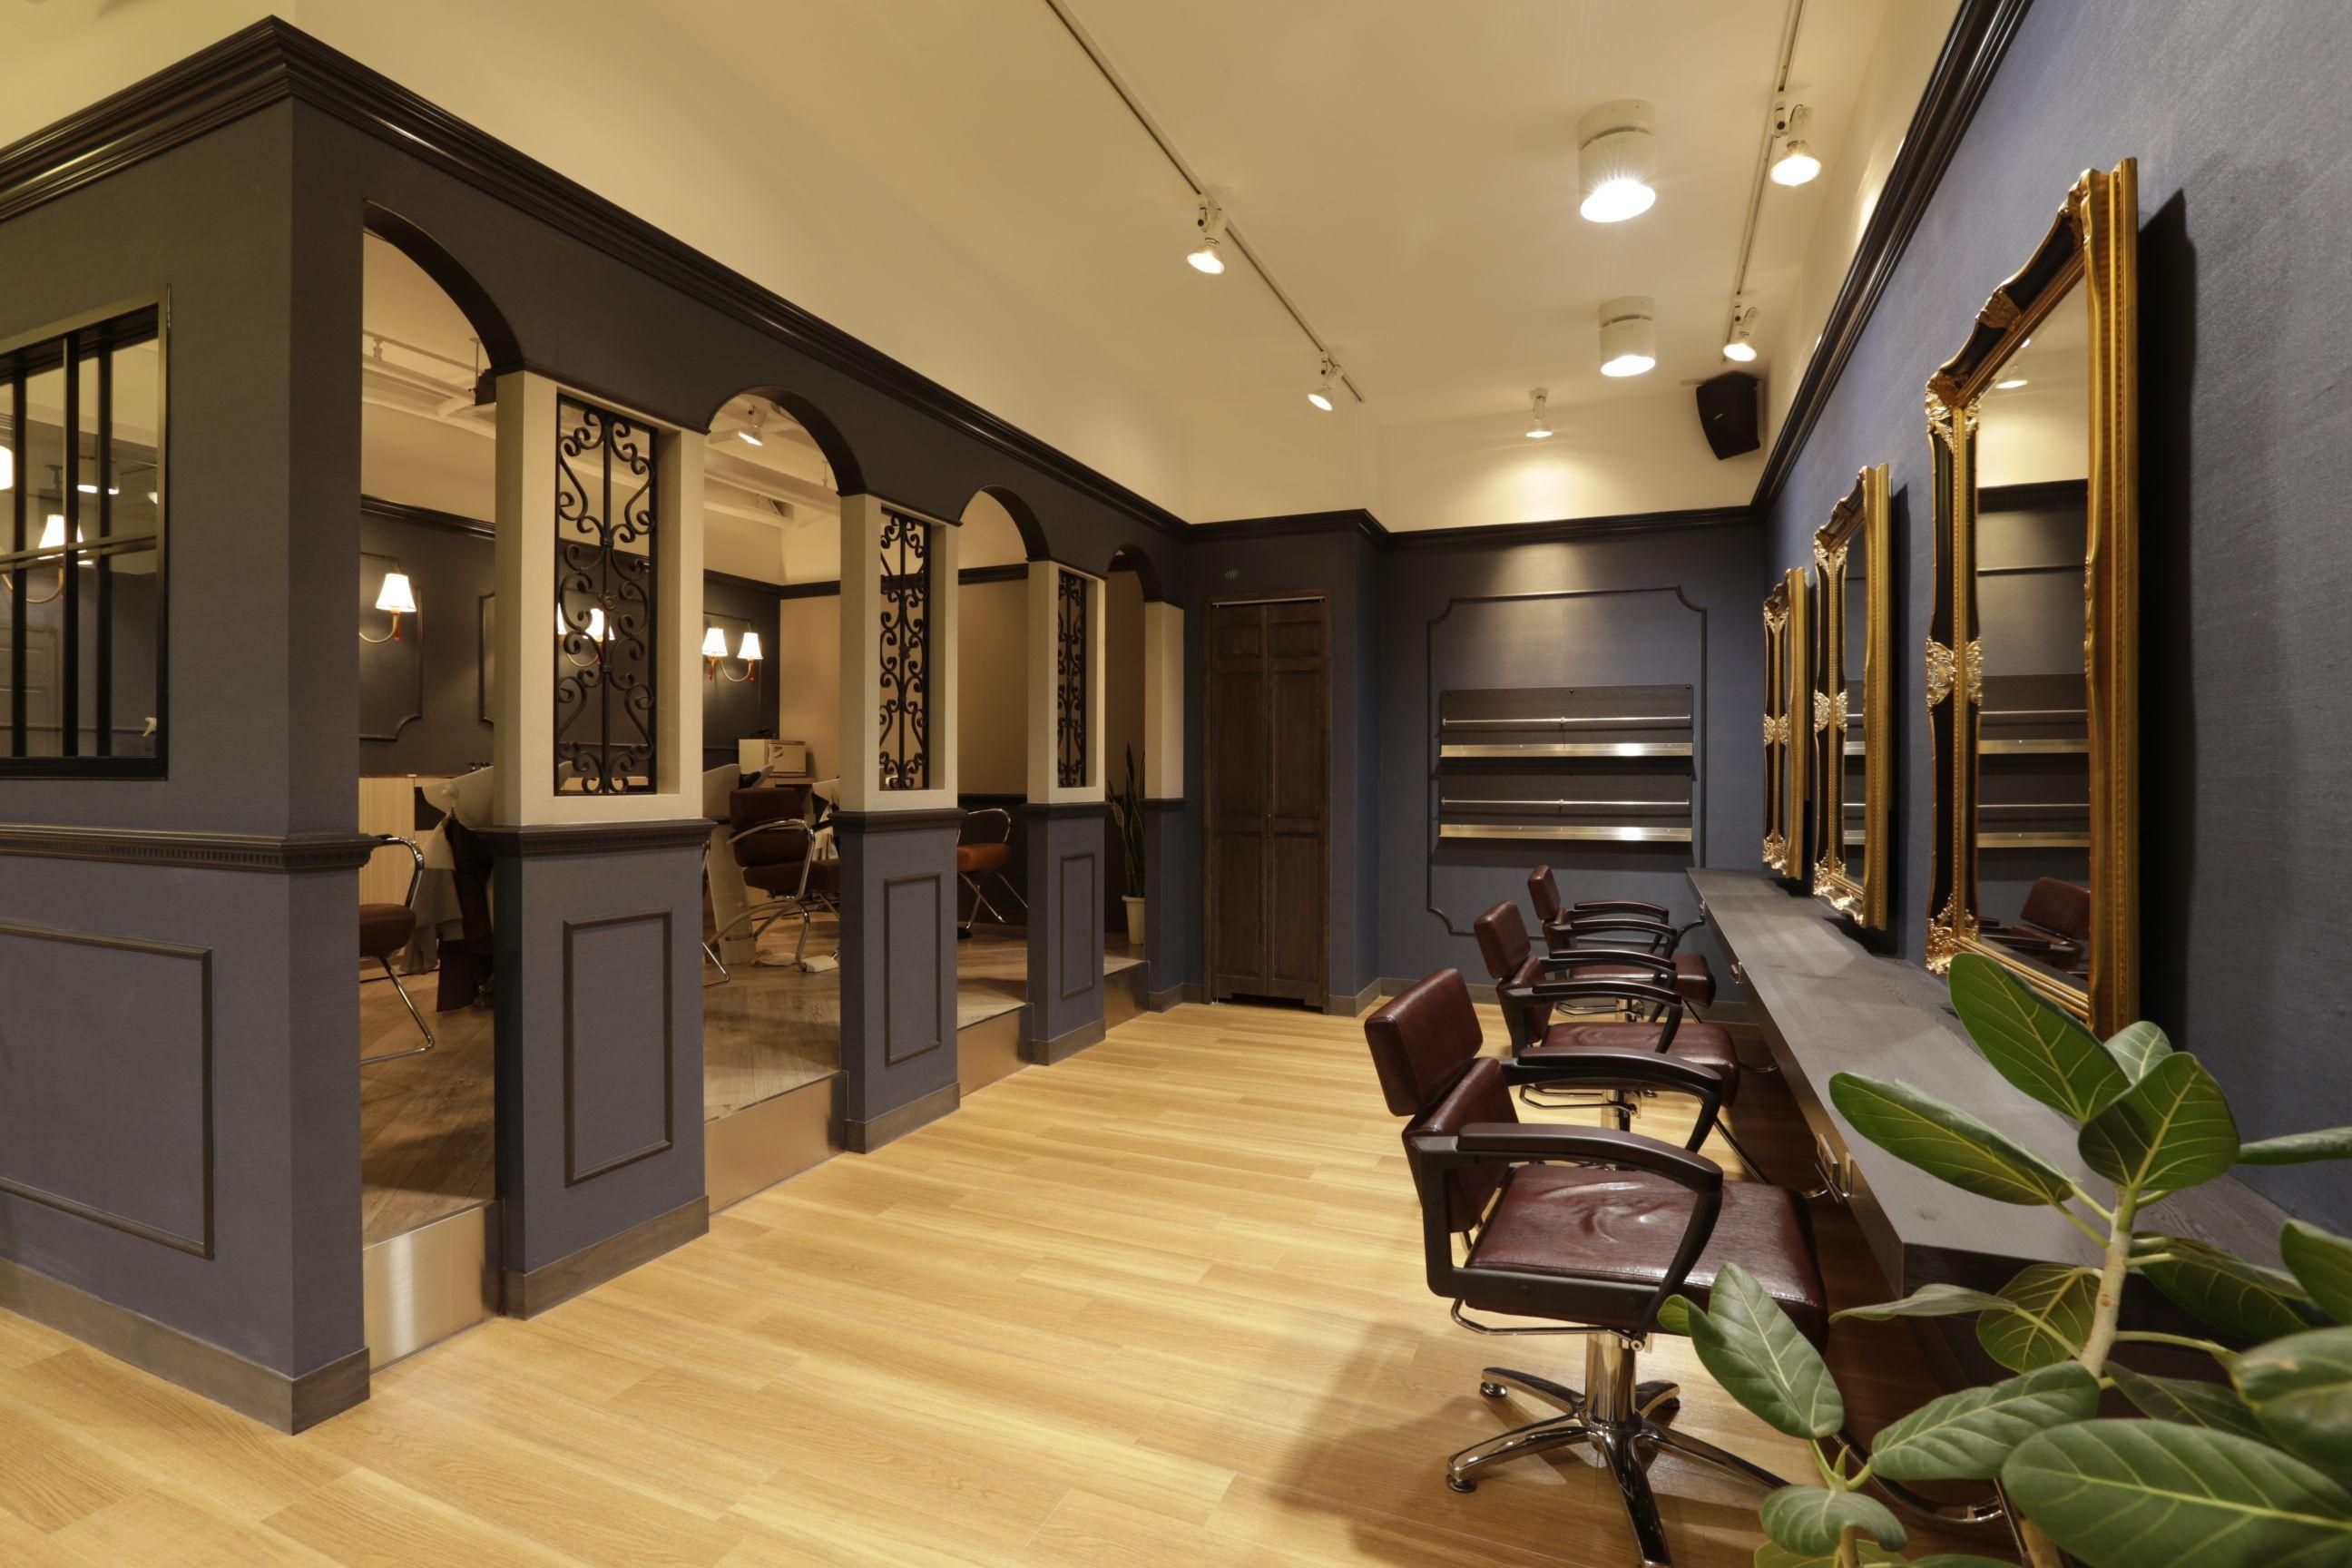 Pin by Kelsey Crawford on Salon ideas  Beauty salon interior Beauty salon decor Salon